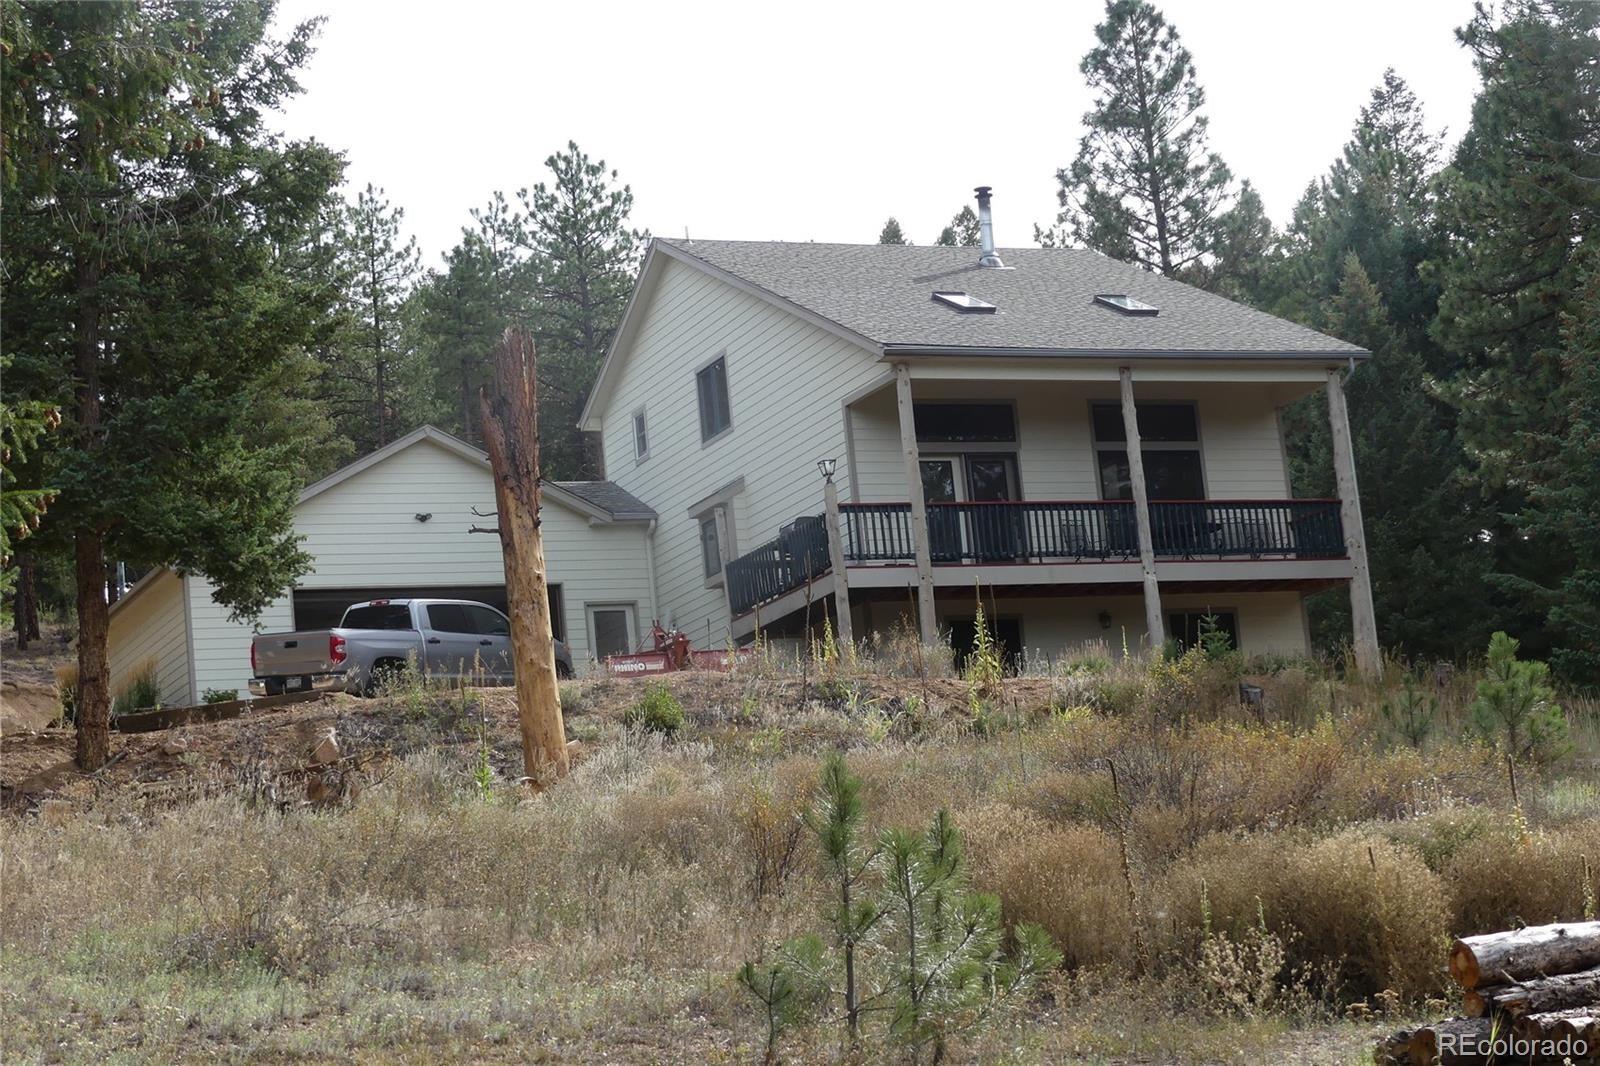 MLS# 7936975 - 1 - 13645 Pine Creek Road, Sedalia, CO 80135